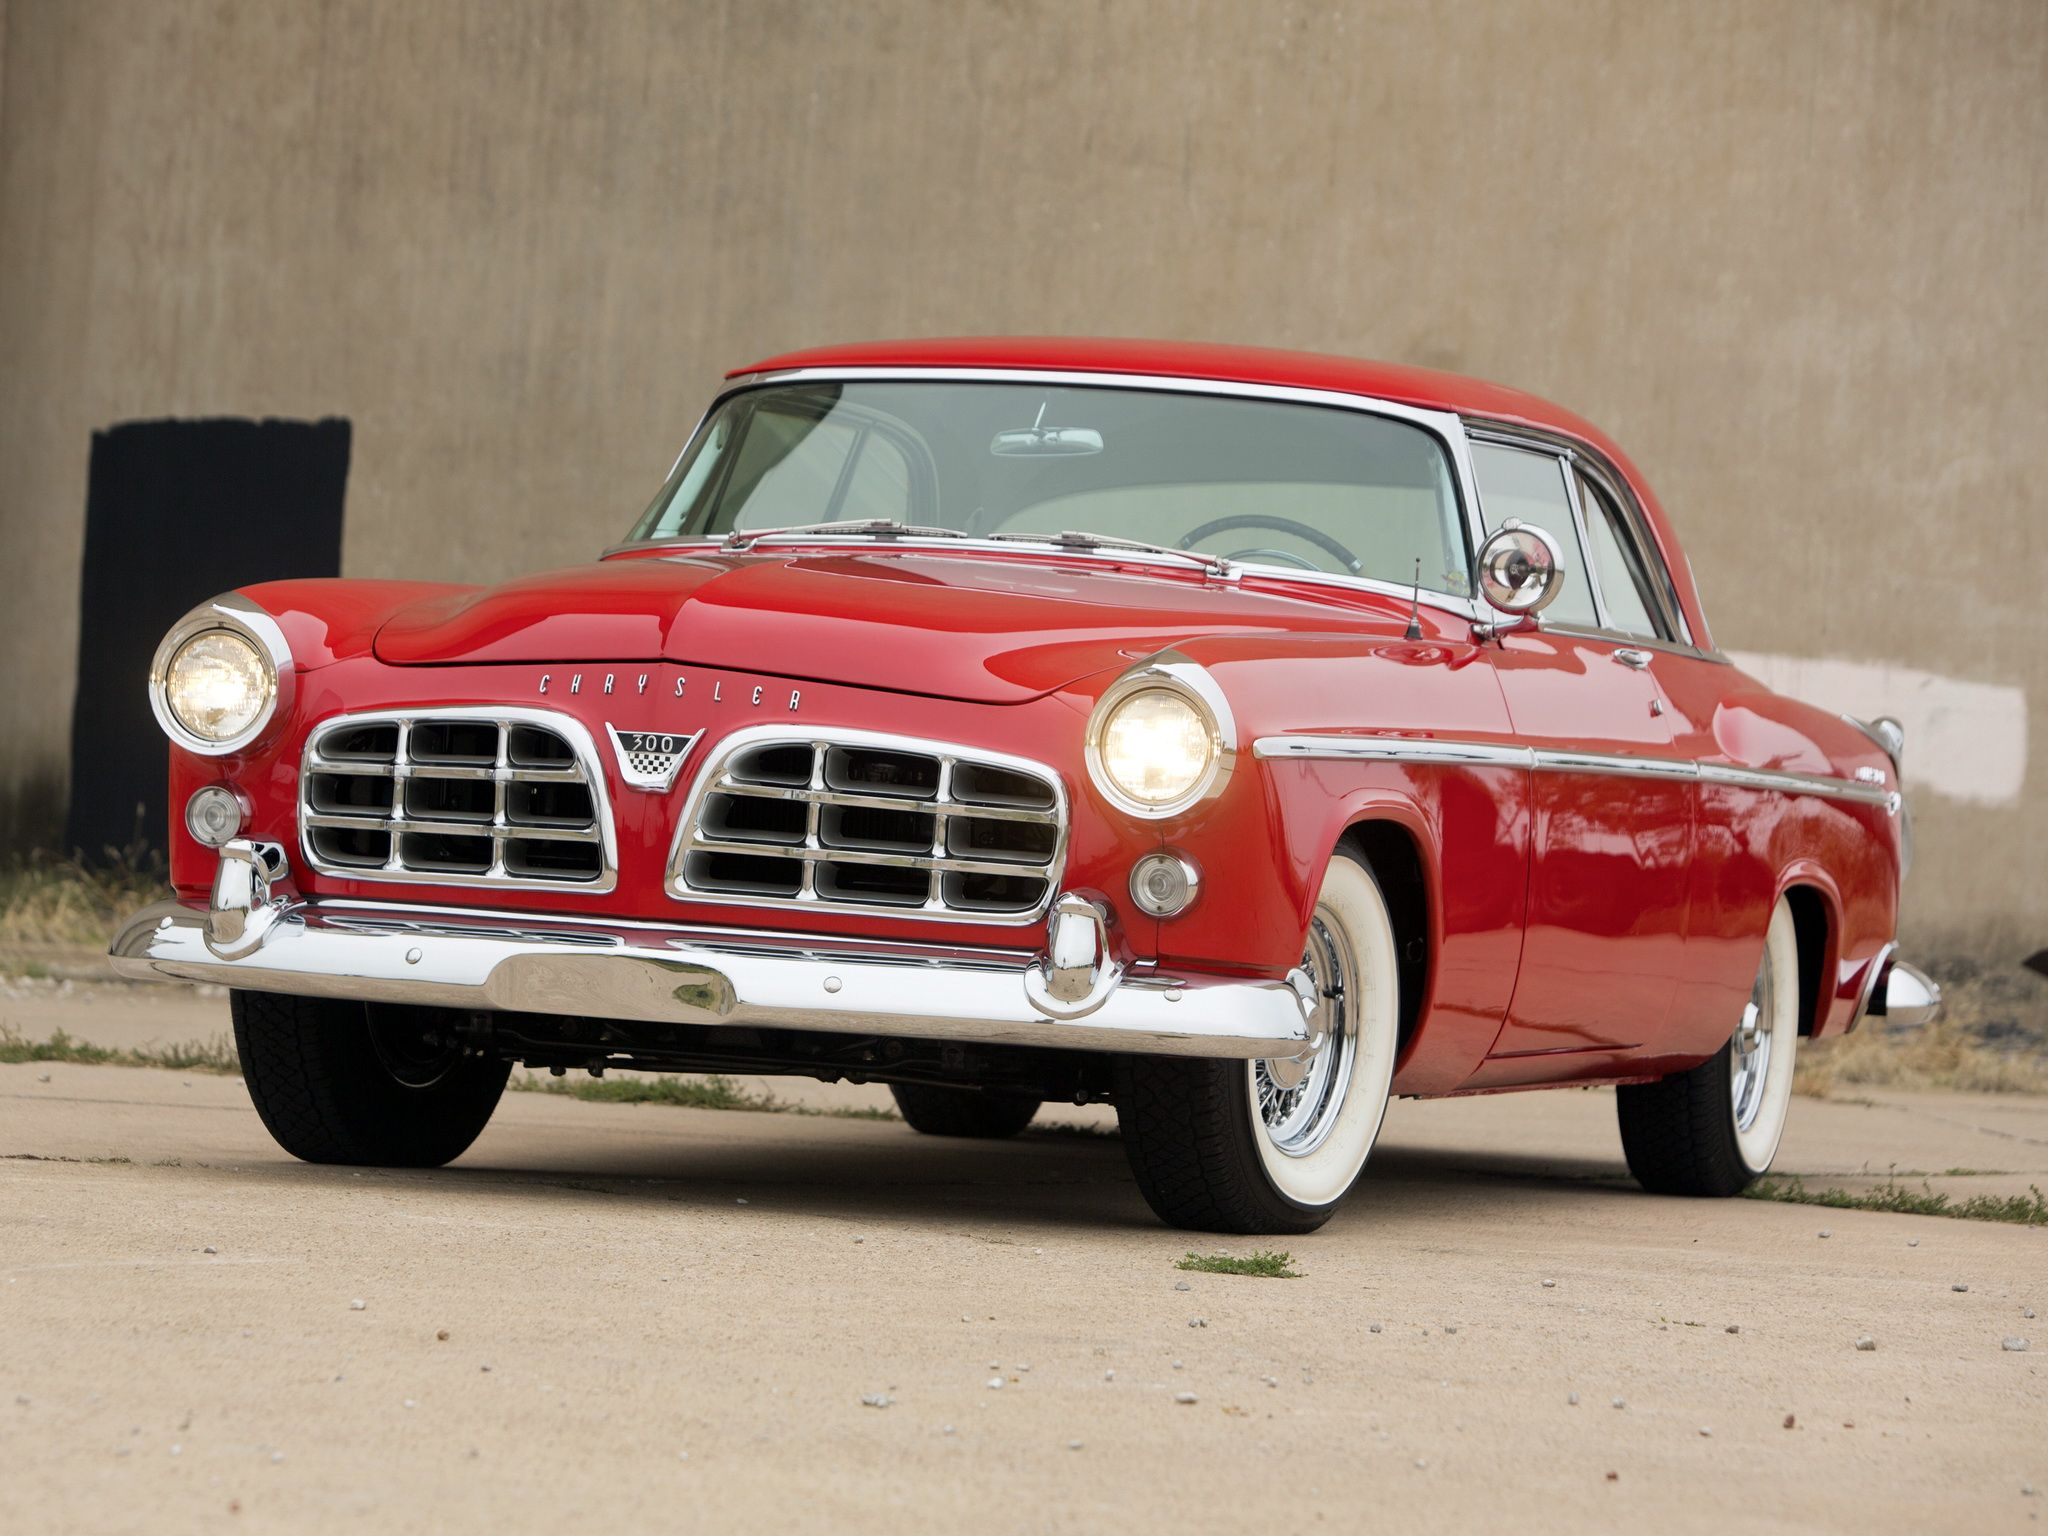 1036c8841878d525eb9e12a3d63e0c41 Great Description About 1955 Chrysler 300 for Sale with Inspiring Images Cars Review